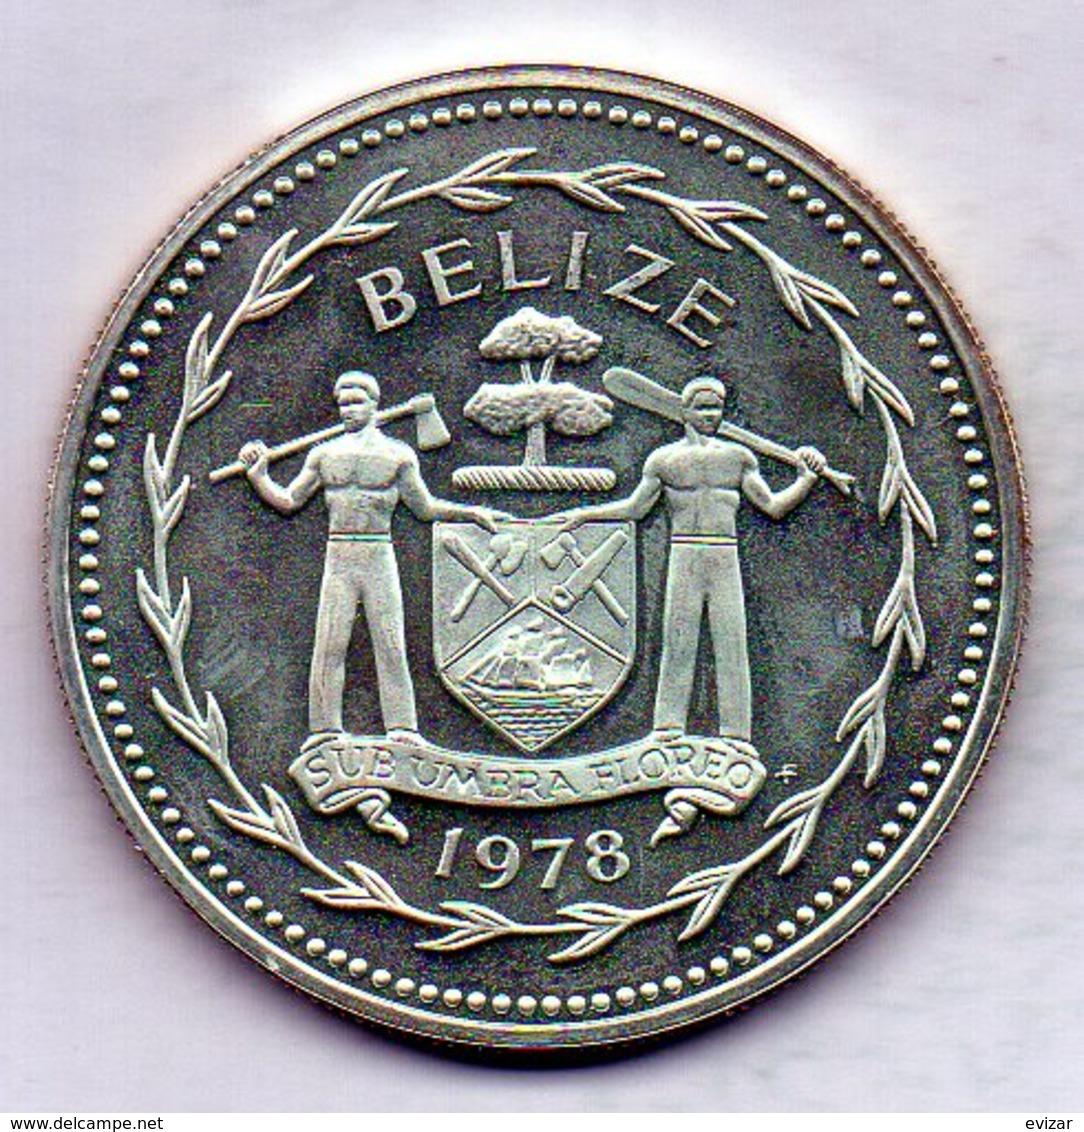 BELIZE, 5 Dollars, Silver, Year 1978, KM #44a - Belize